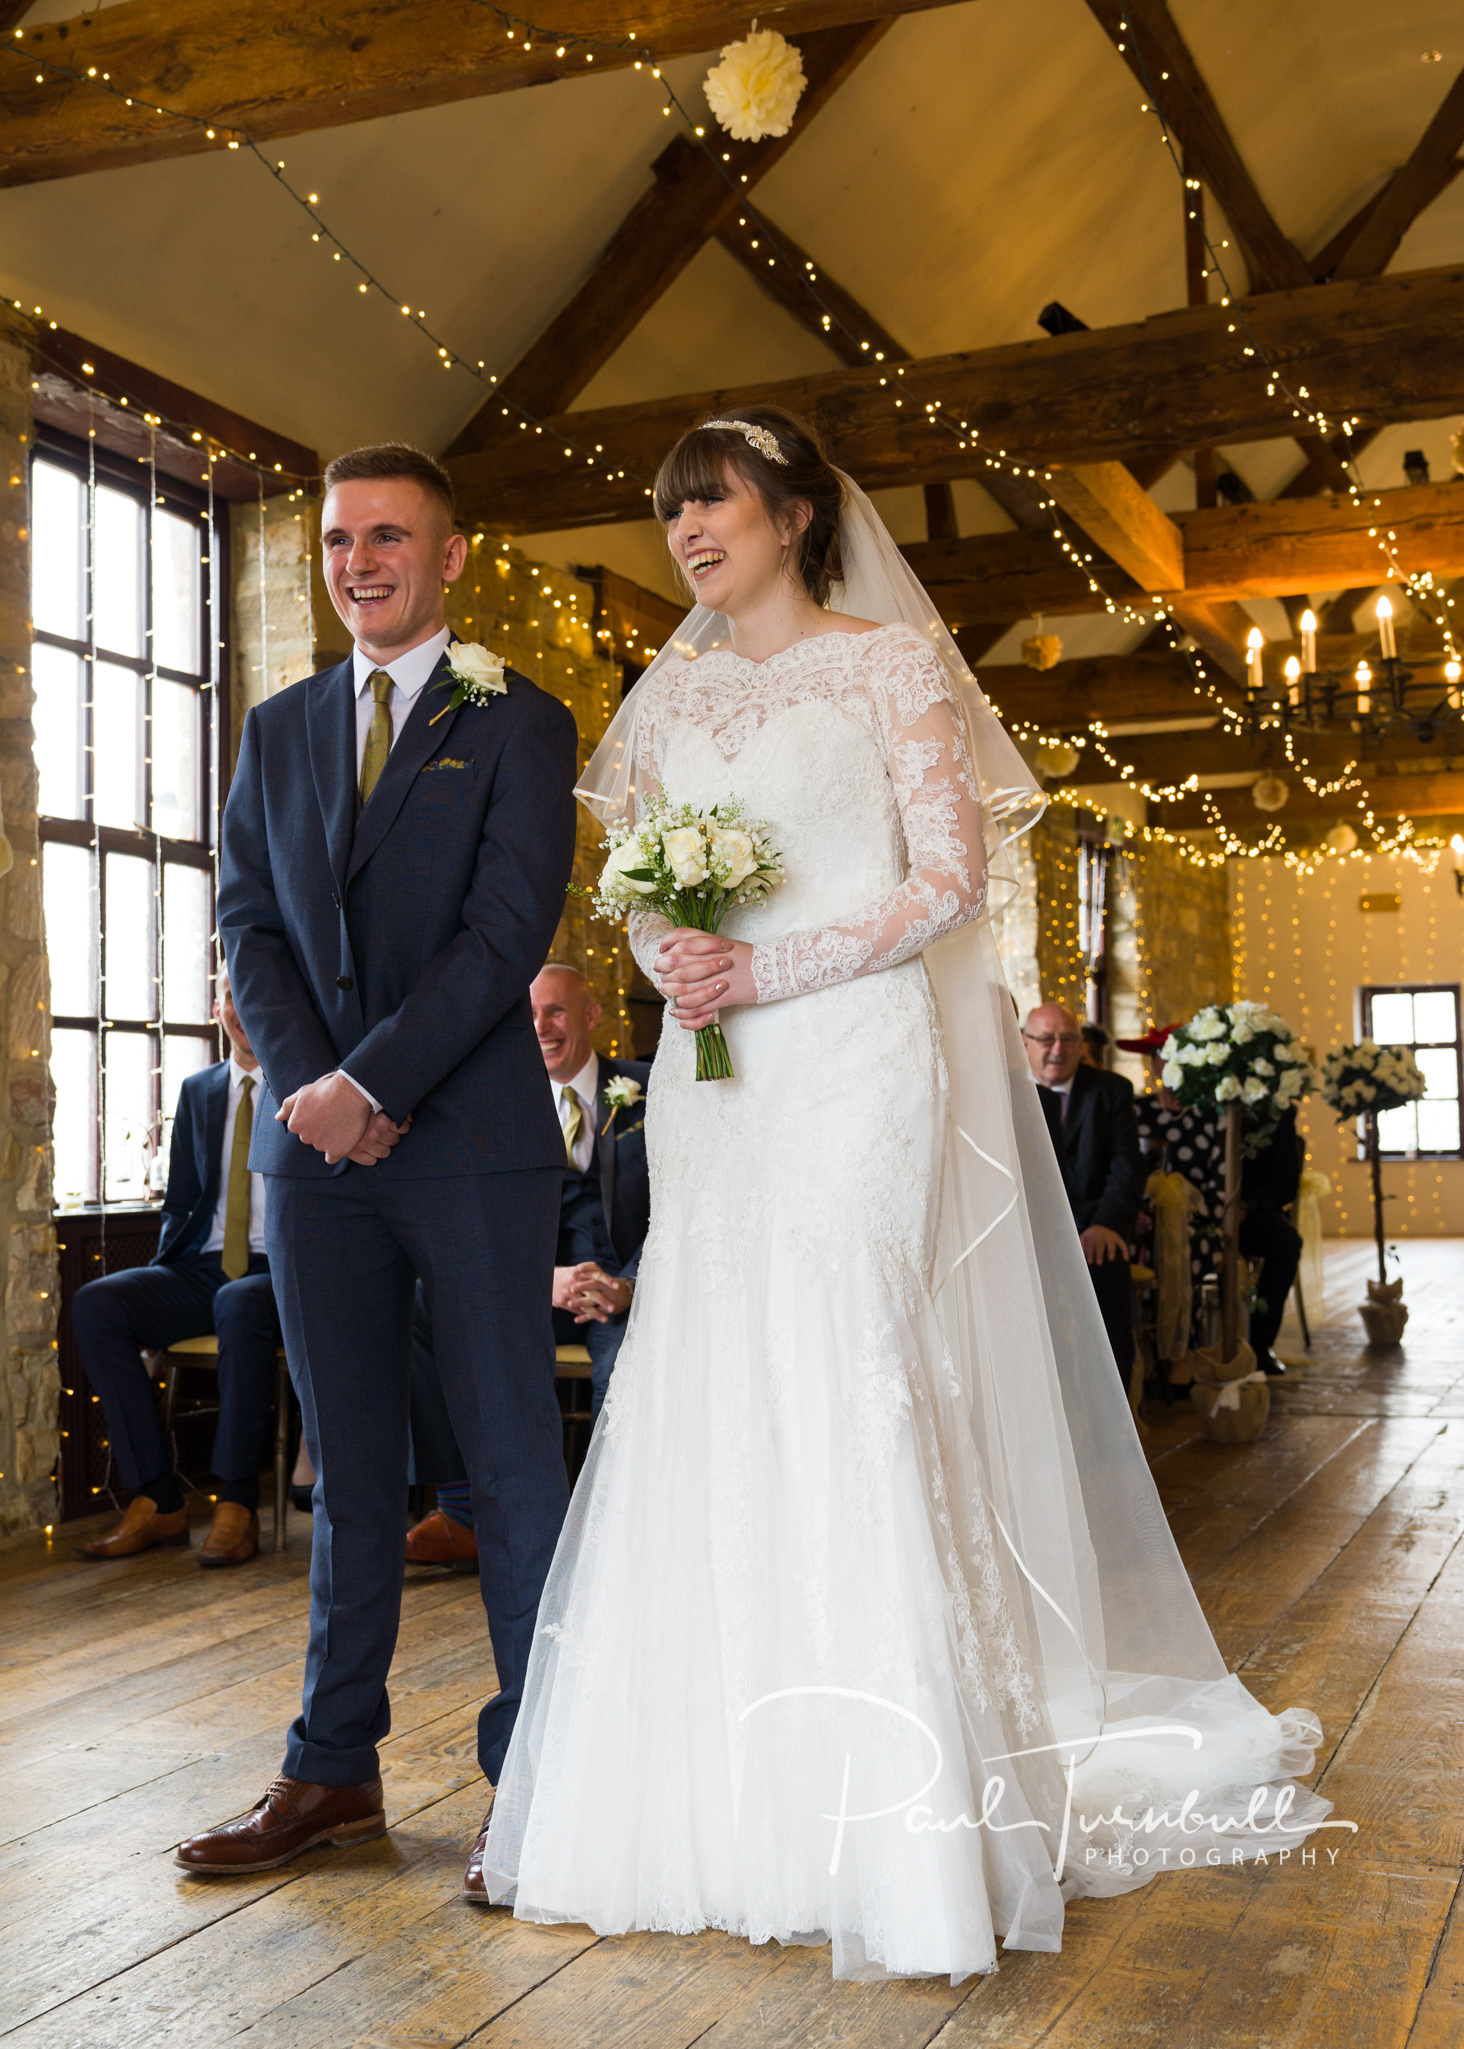 wedding-photographer-raven-hall-ravenscroft--scarborough-yorkshire-lucy-ryan-039.jpg